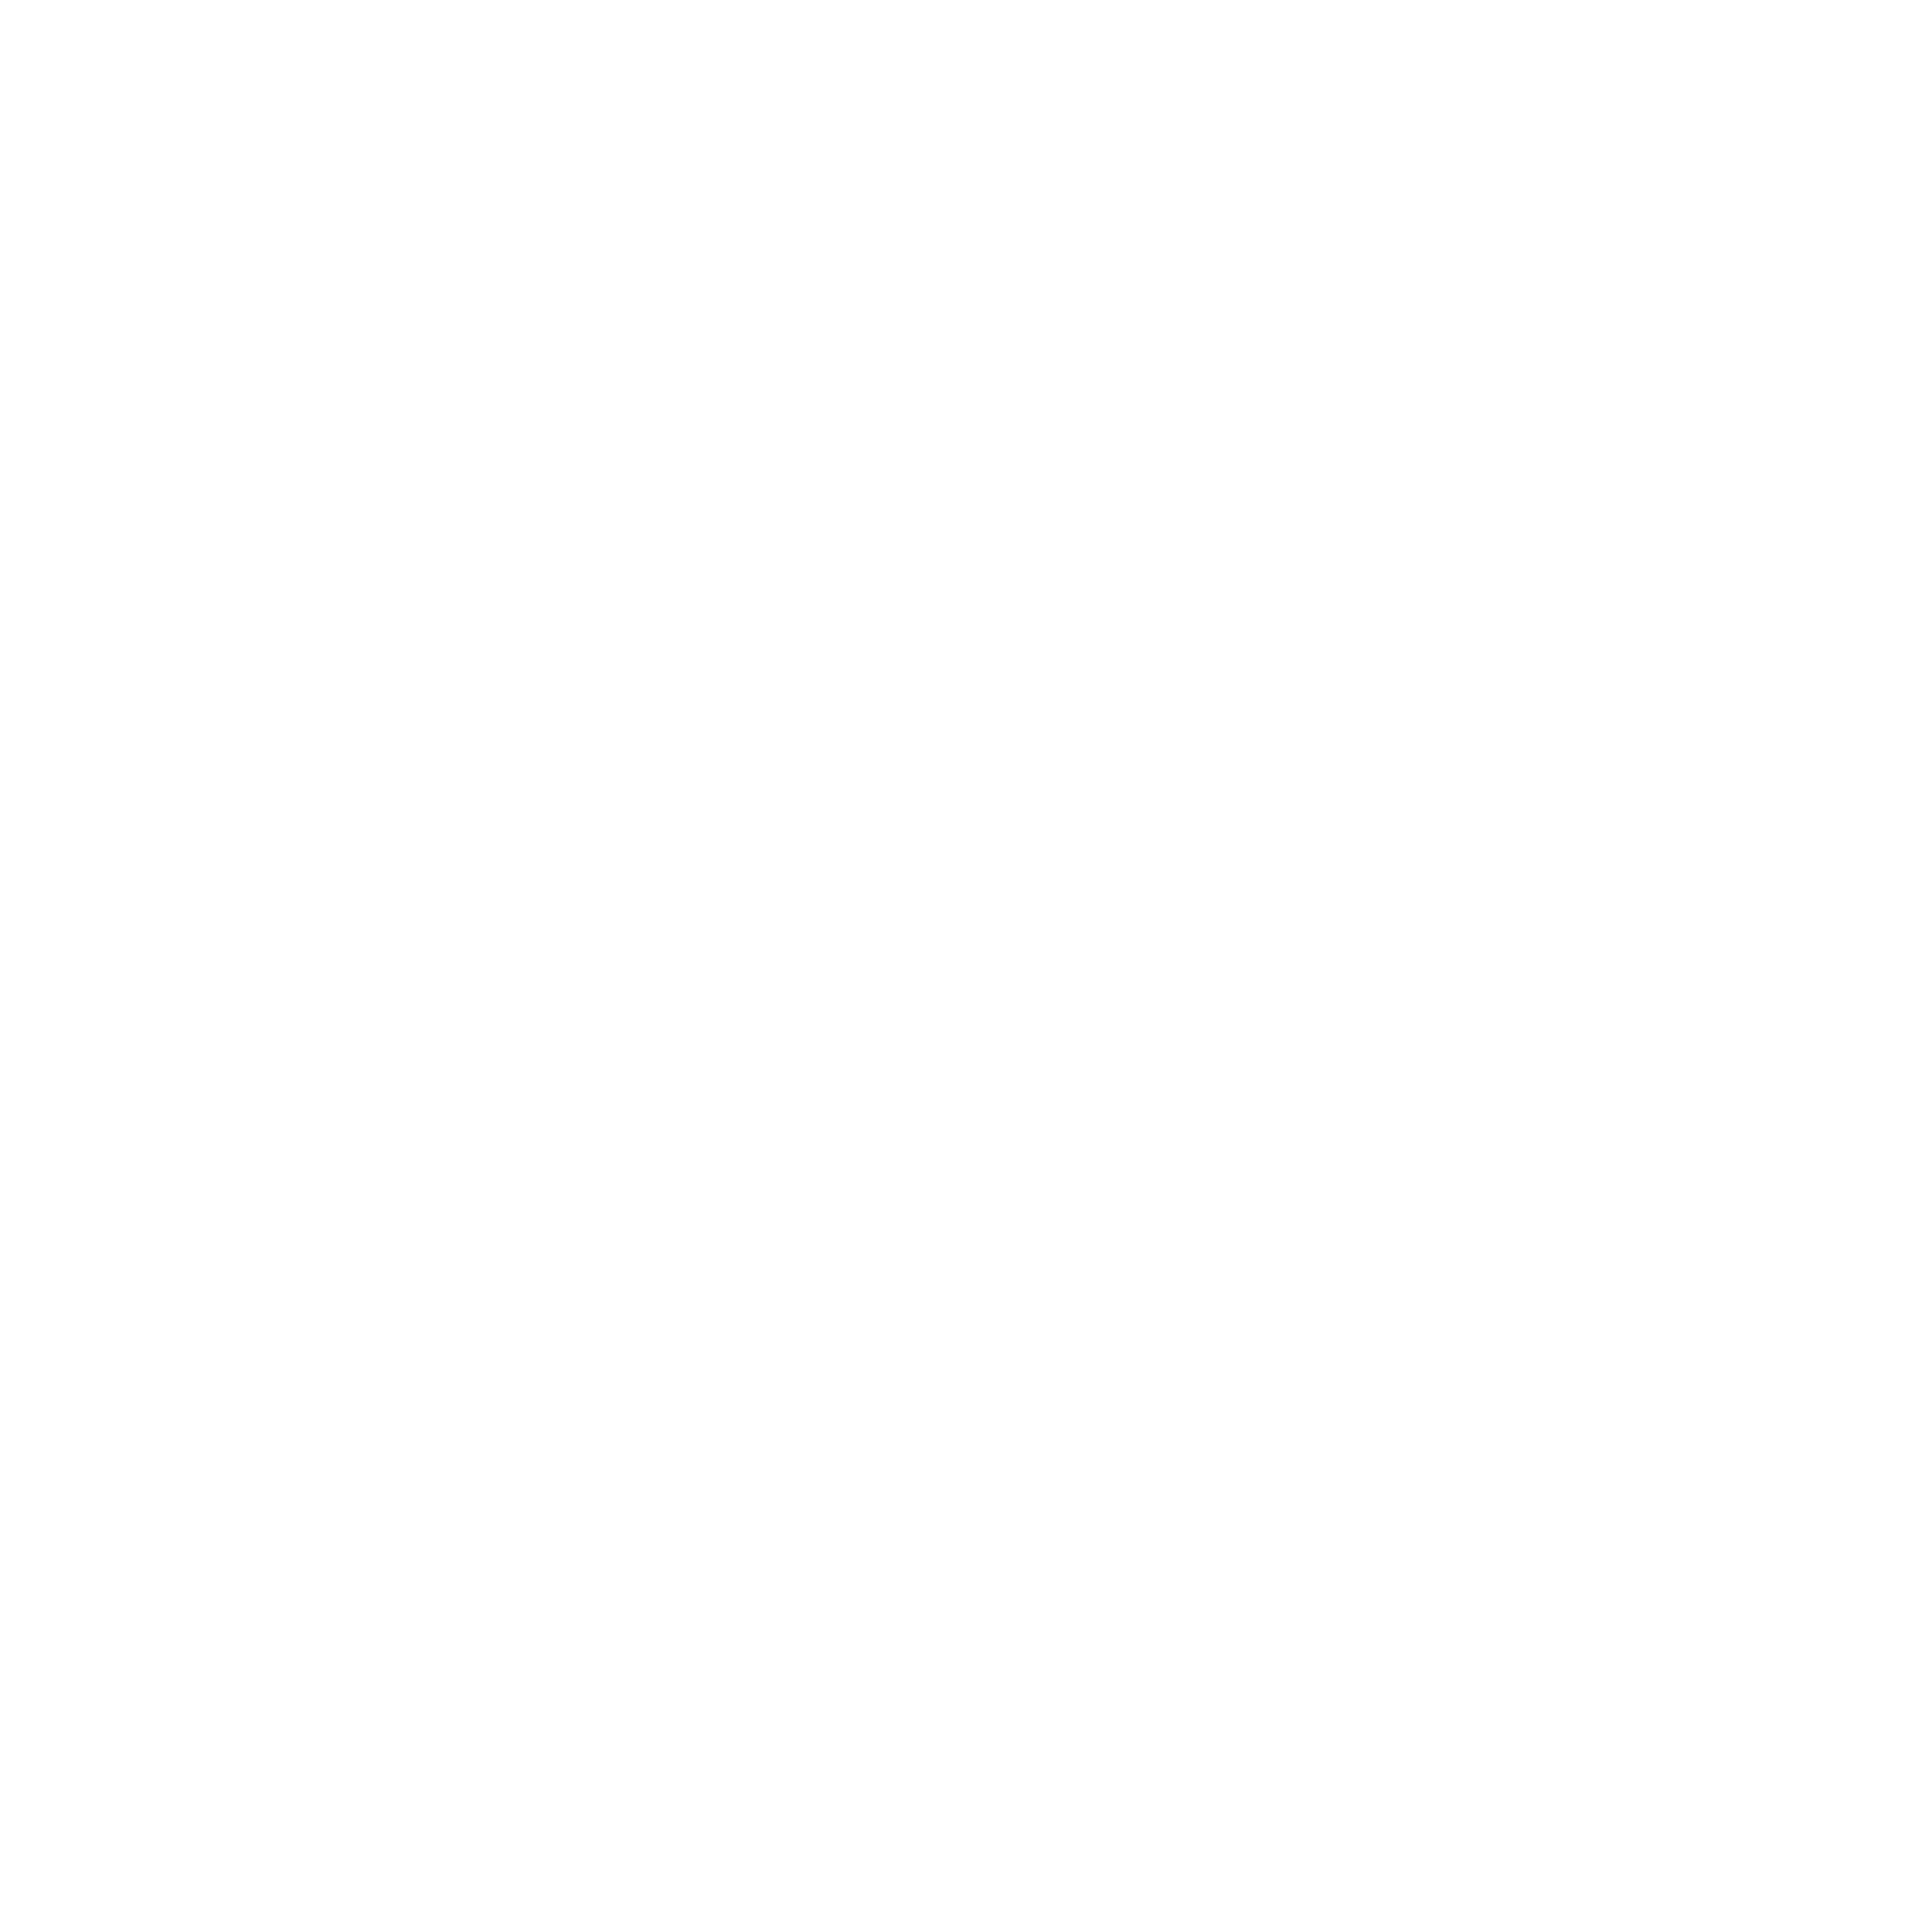 visit berrysustainable.com